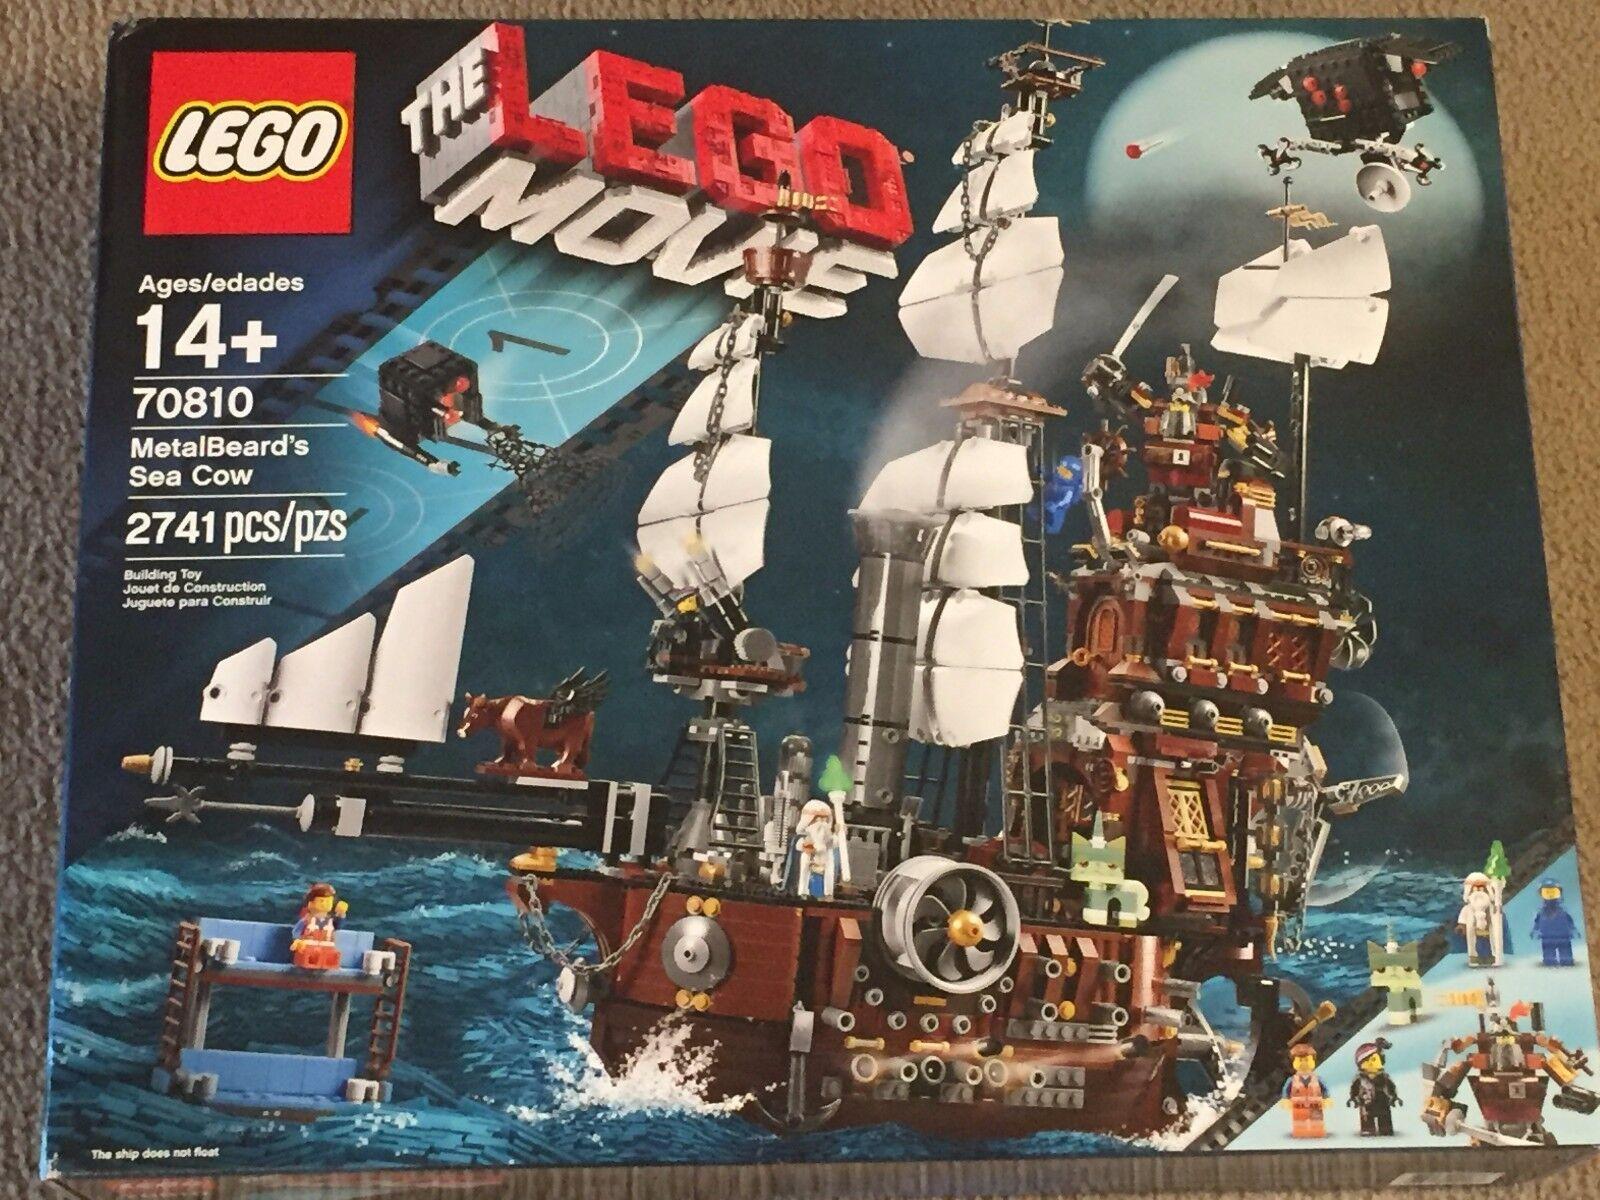 Lego 70810 MetalBeard's Sea Cow 70810 - LEGO Movie Ship - Retired - NEW